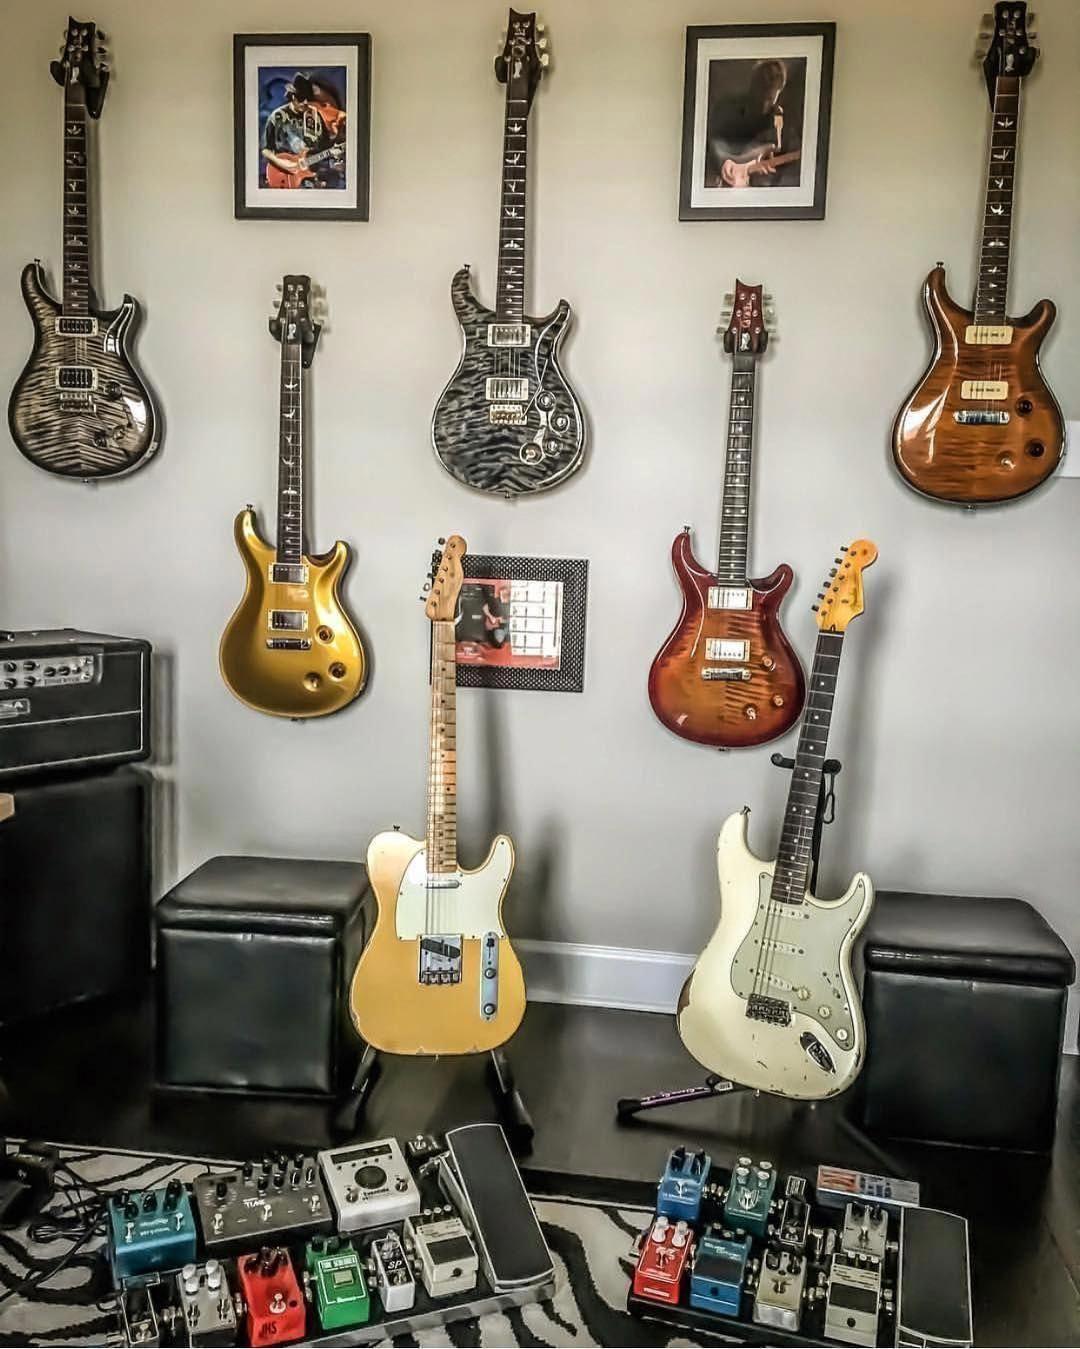 17 Splendid Travel Guitar Stand Travel Guitar Left Guitarsolo Guitarhero Travelguitar Guitar